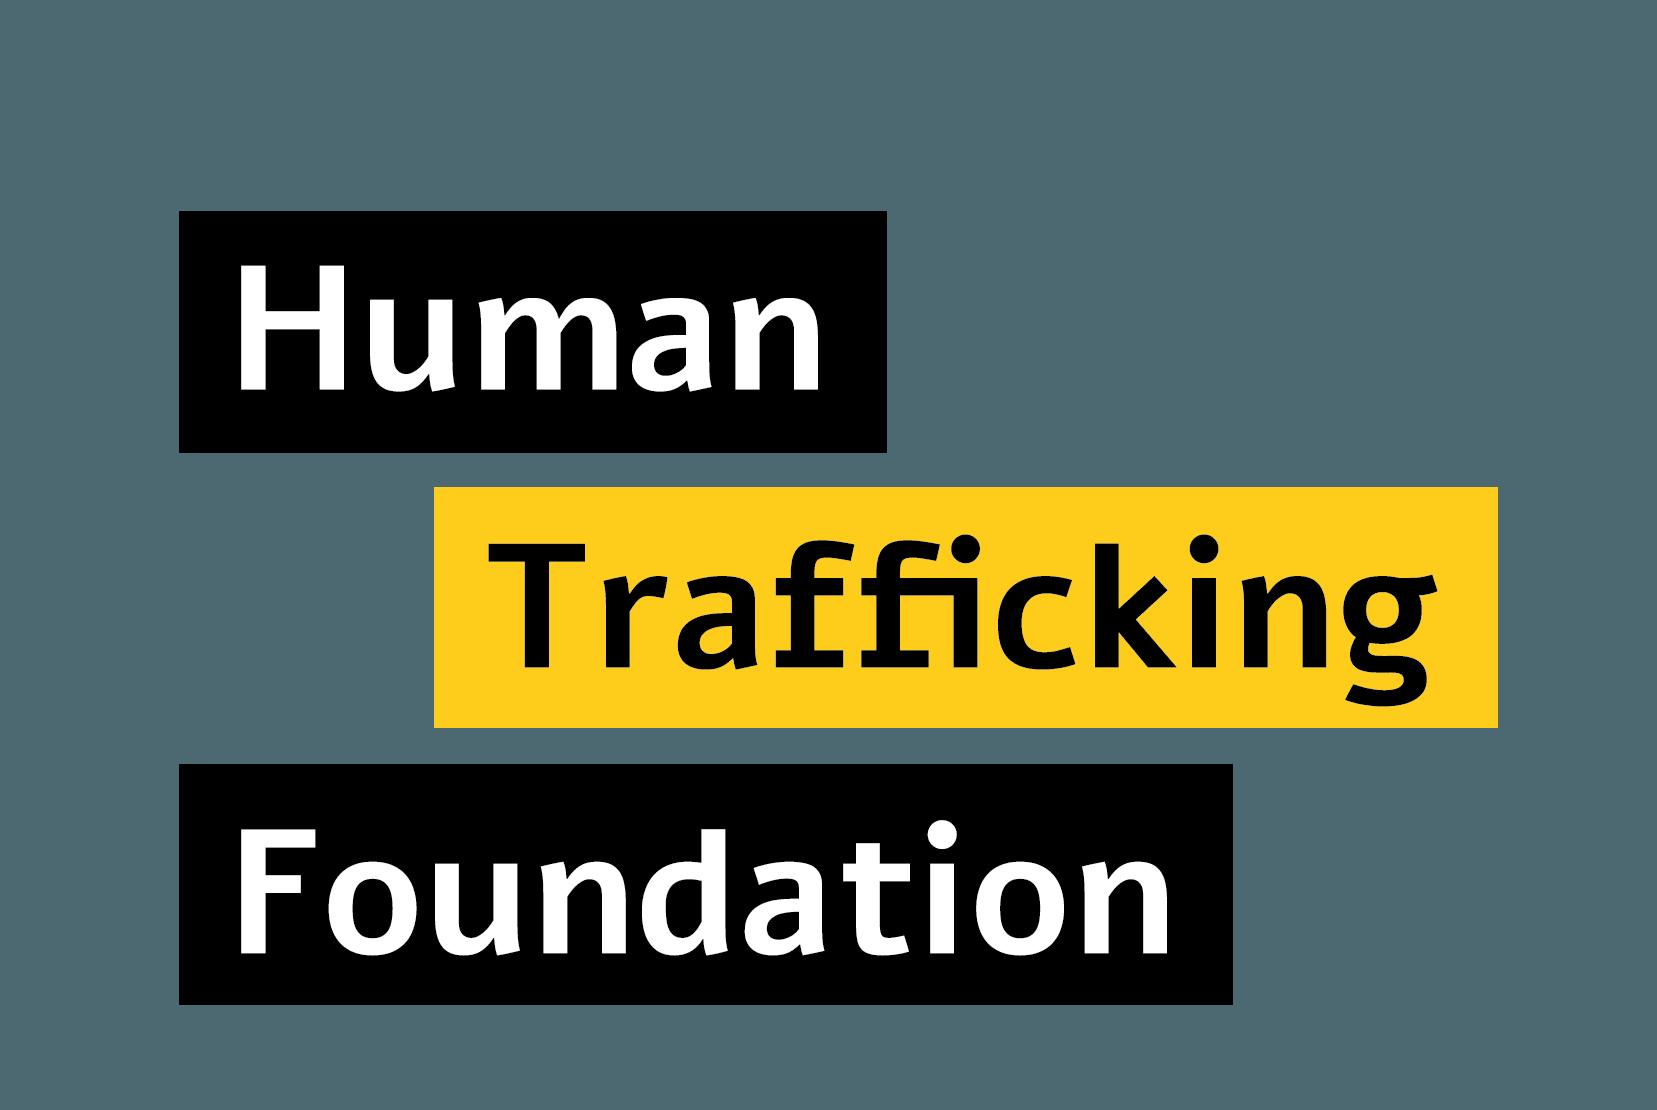 Human-Trafficking-Foundation